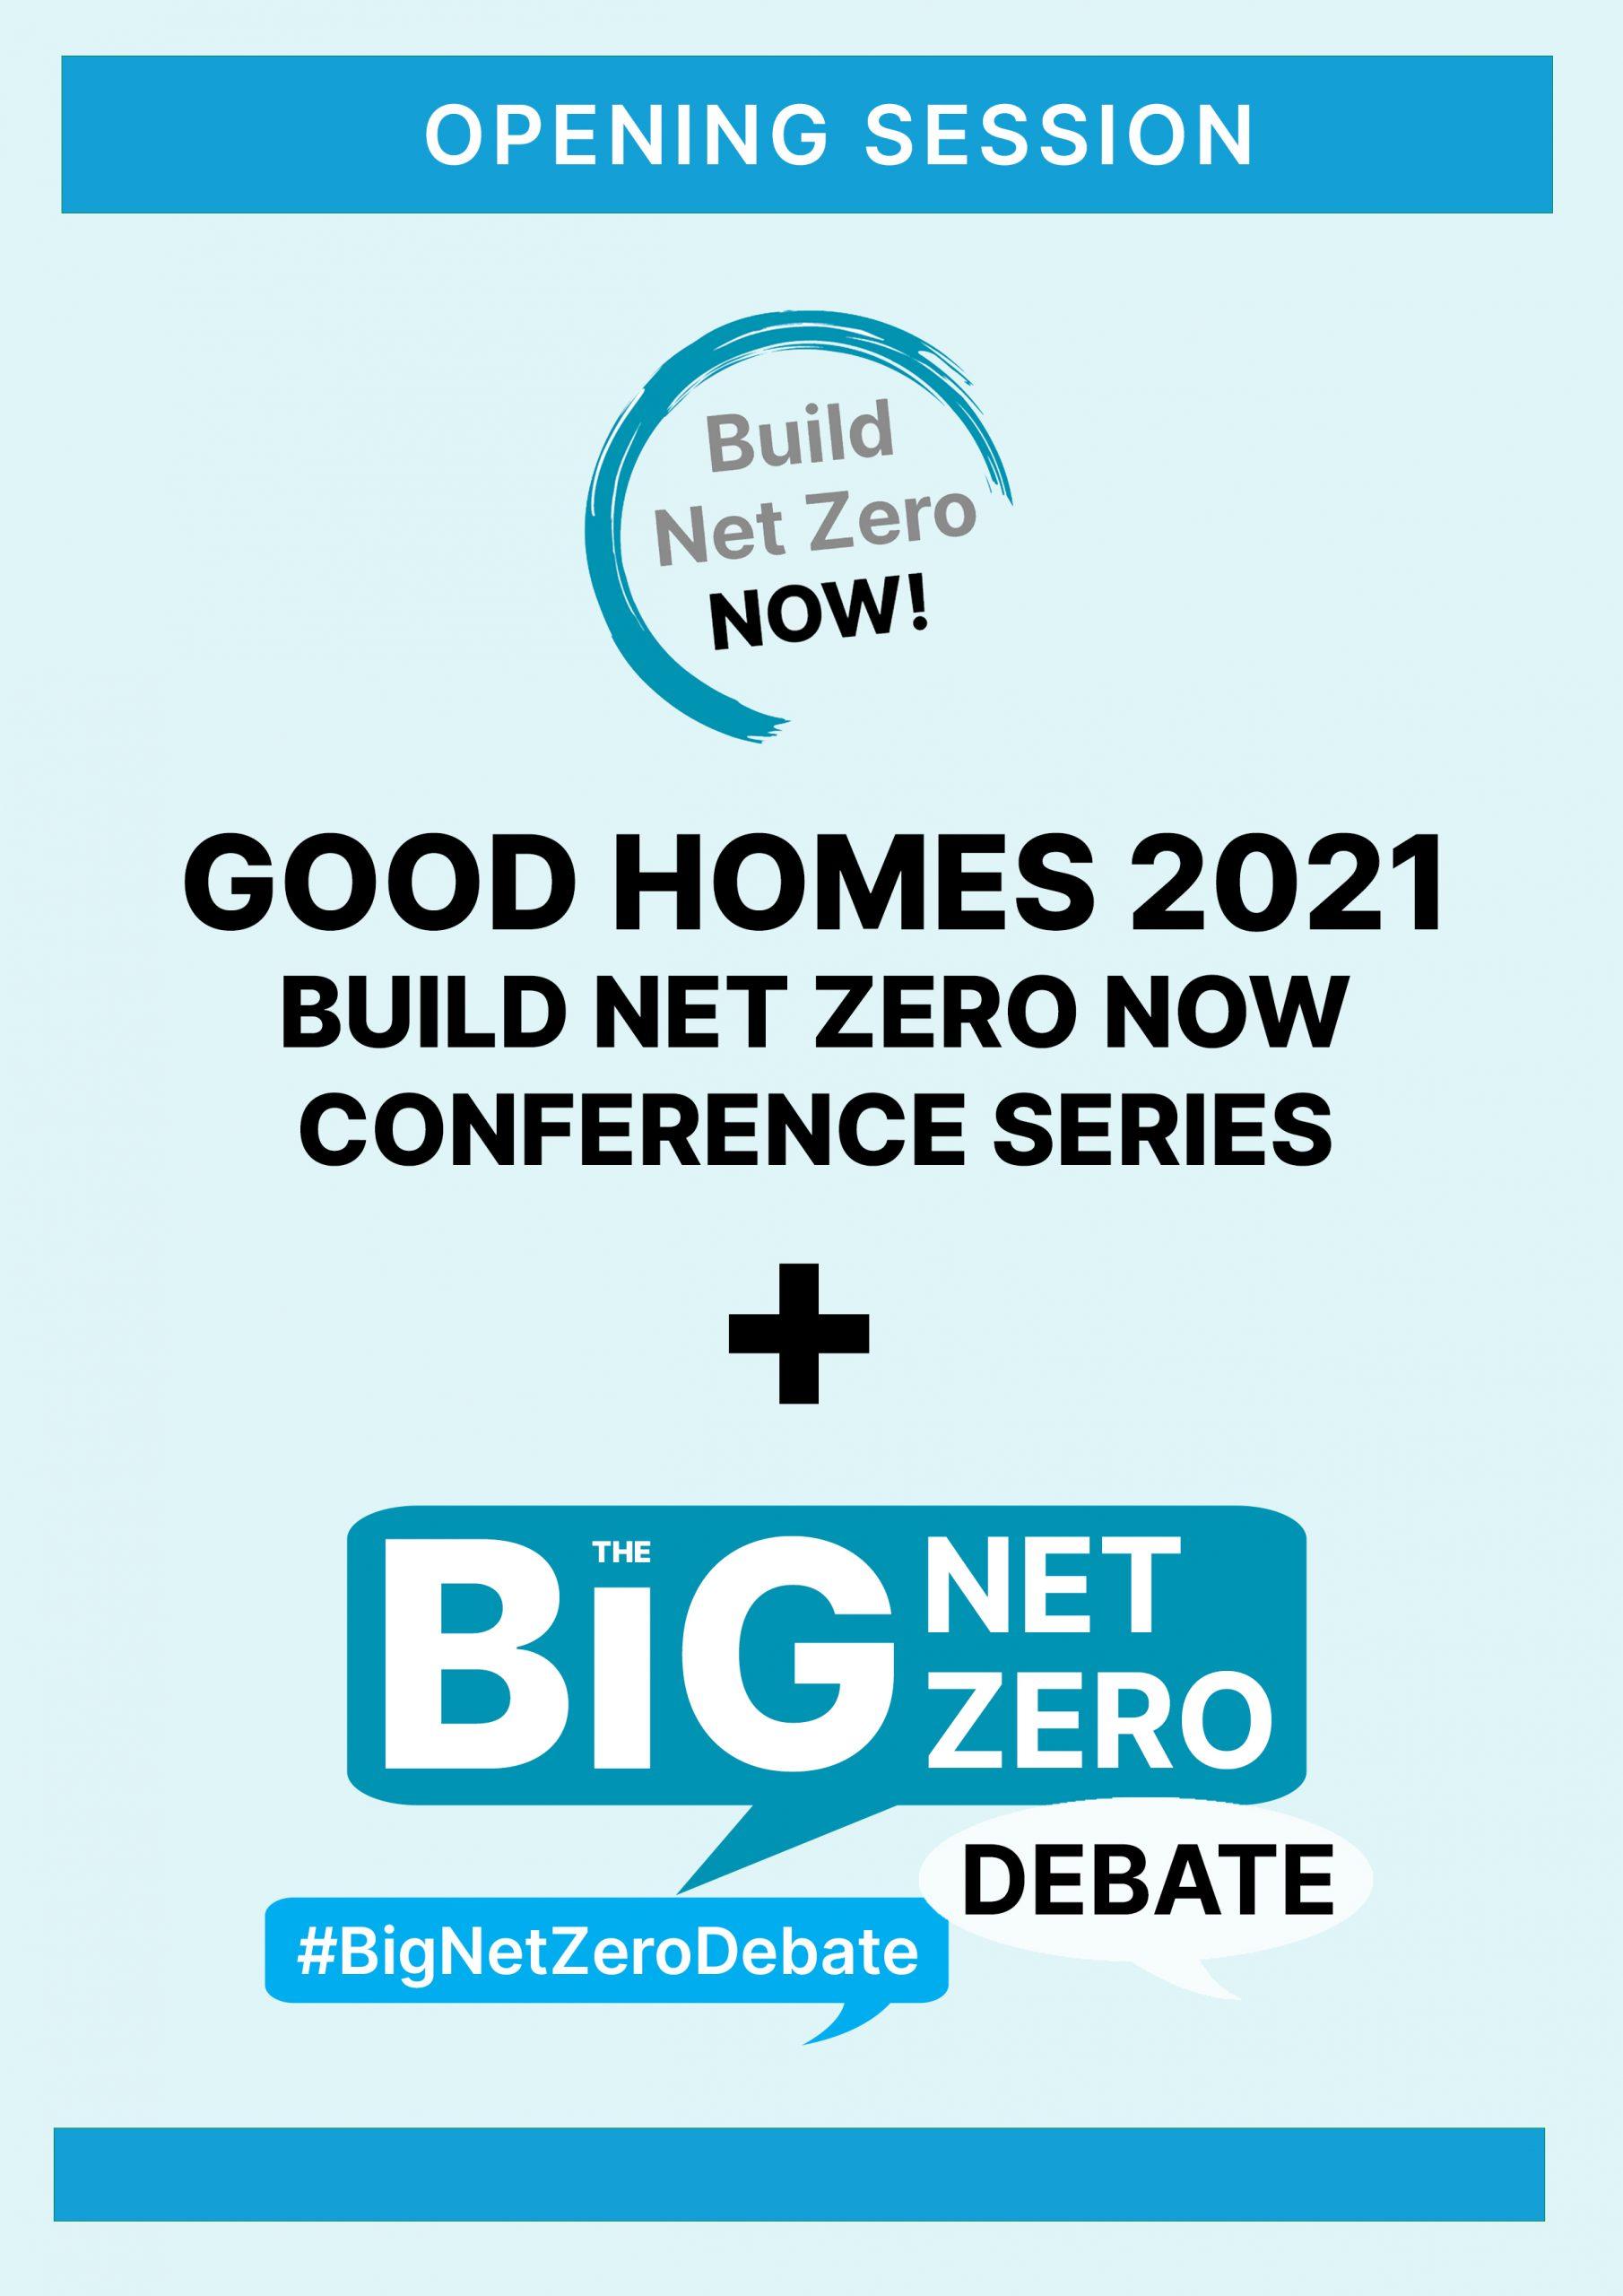 Good Homes 2021 Build Net Zero Now conference series - Opening Session + 'Big Net Zero Debate'